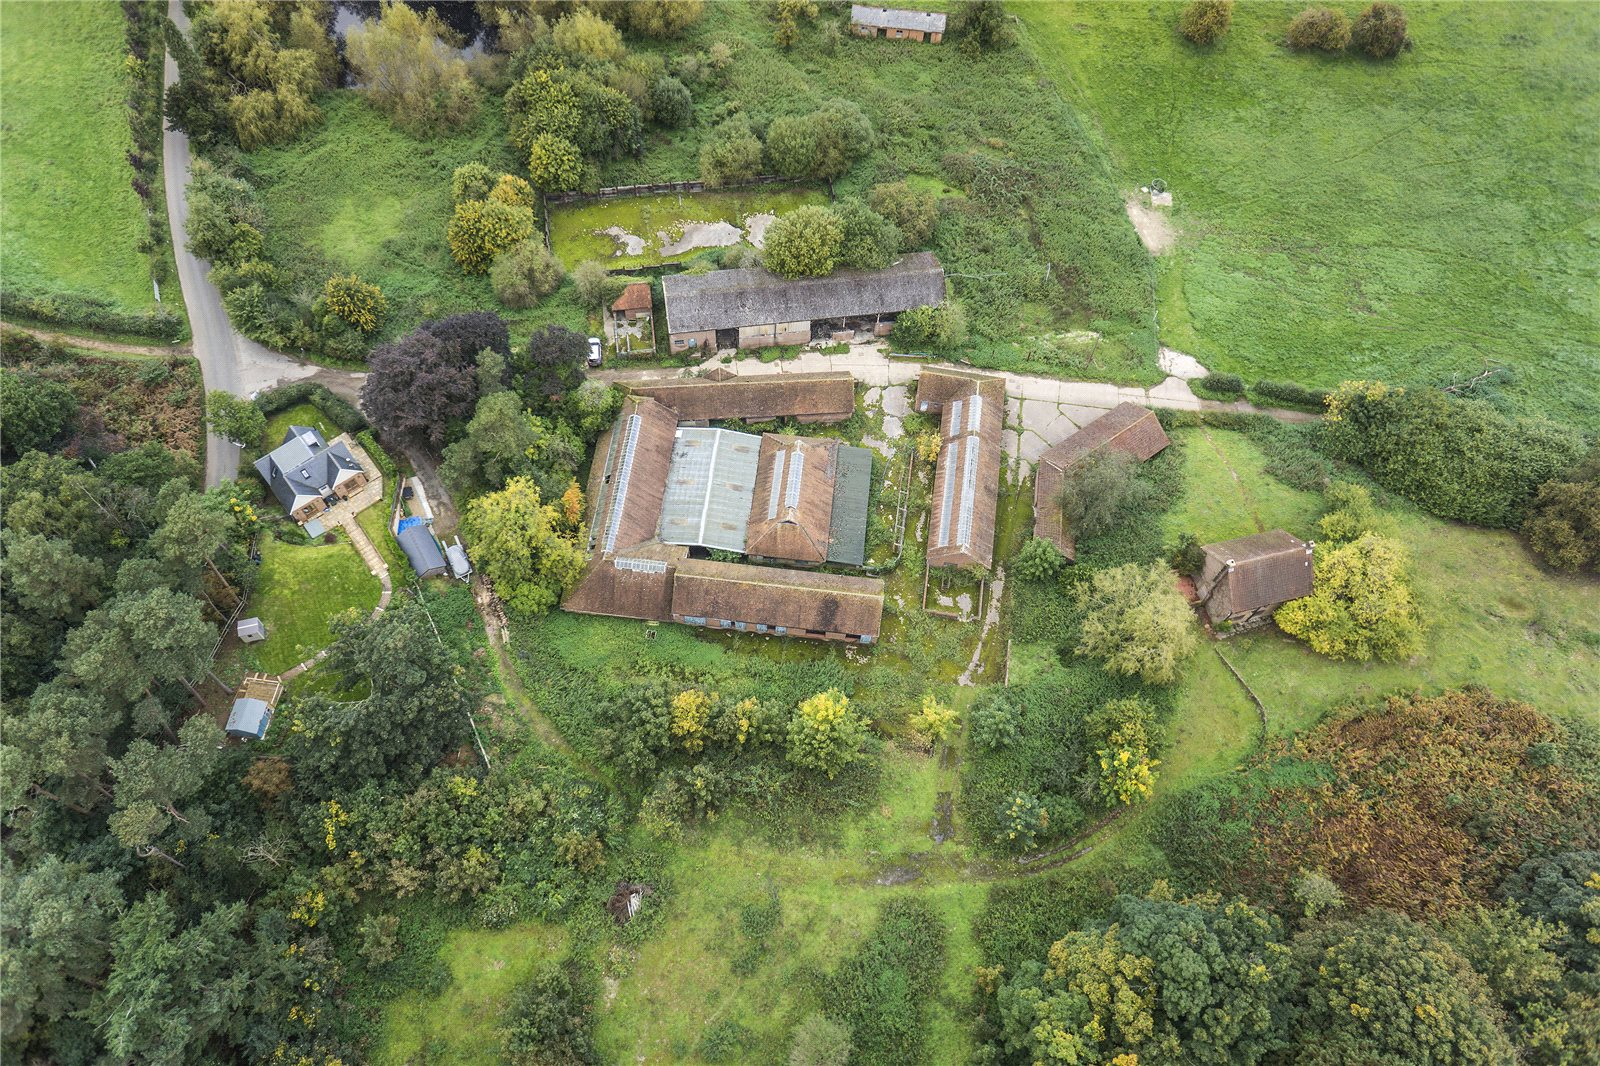 Farm / Ranch / Plantation for Sale at Halfpenny Lane, Guildford, Surrey, GU4 Guildford, England